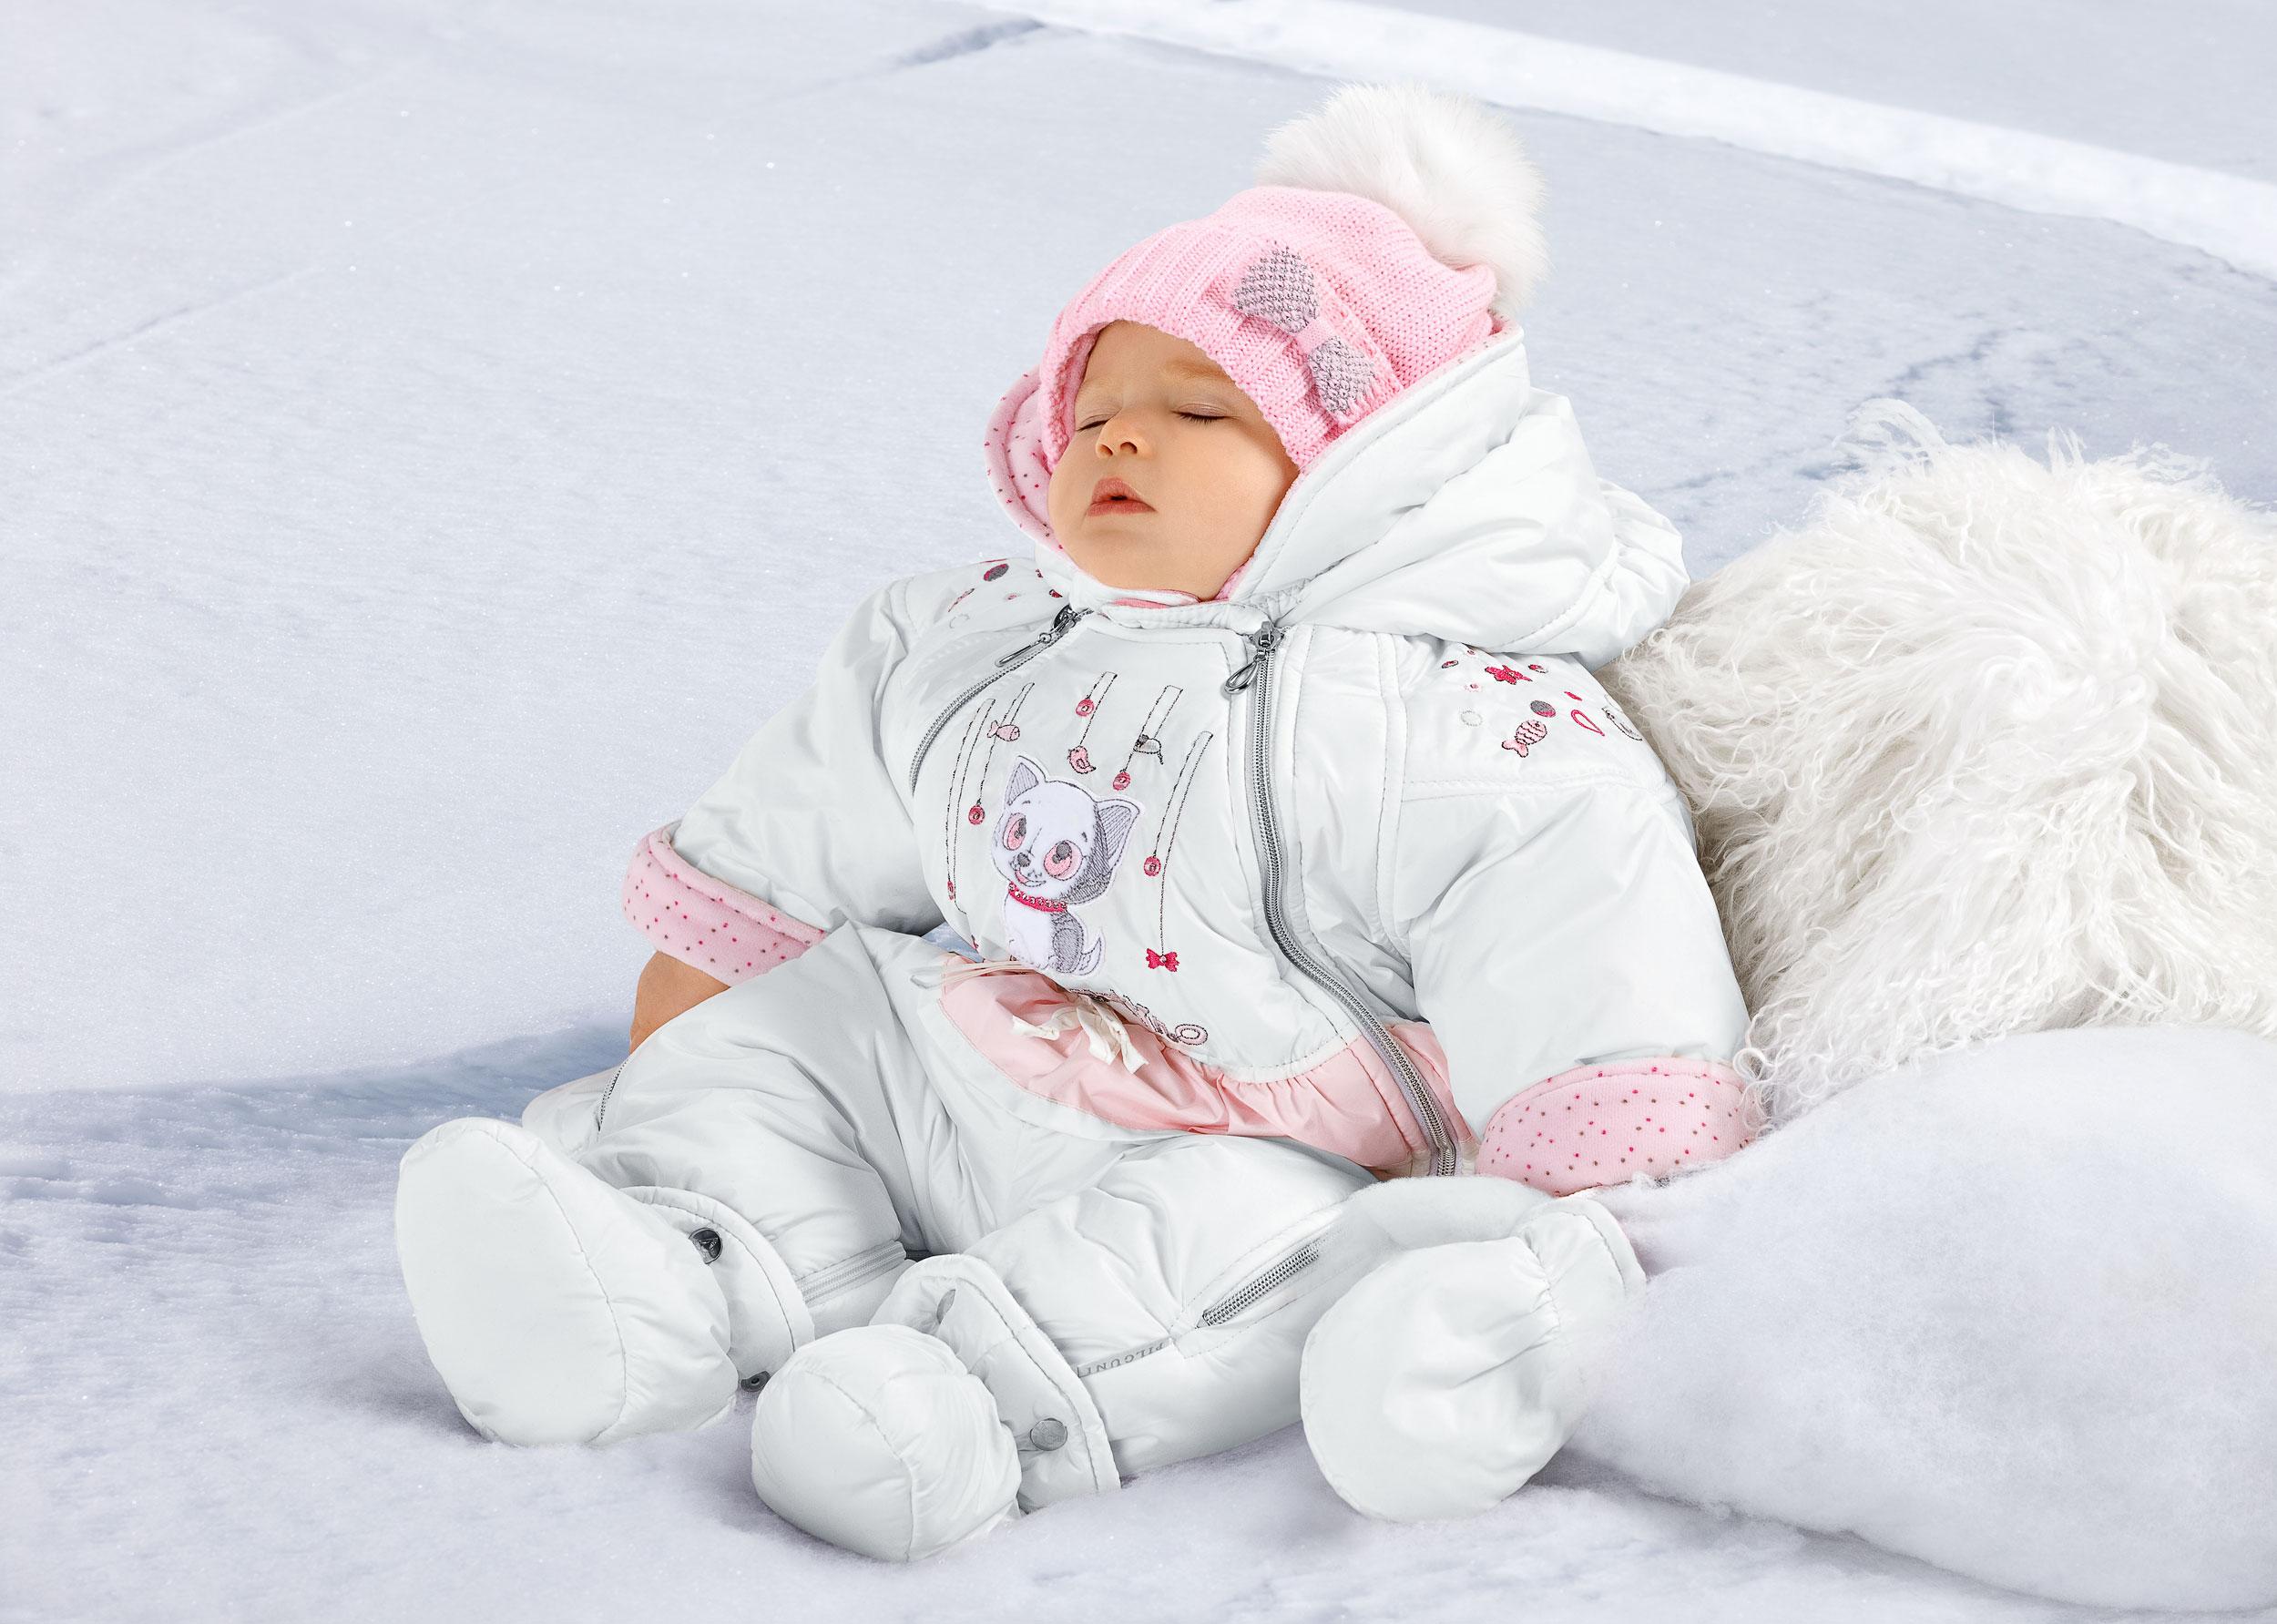 Грудничок в комбинезоне на снегу